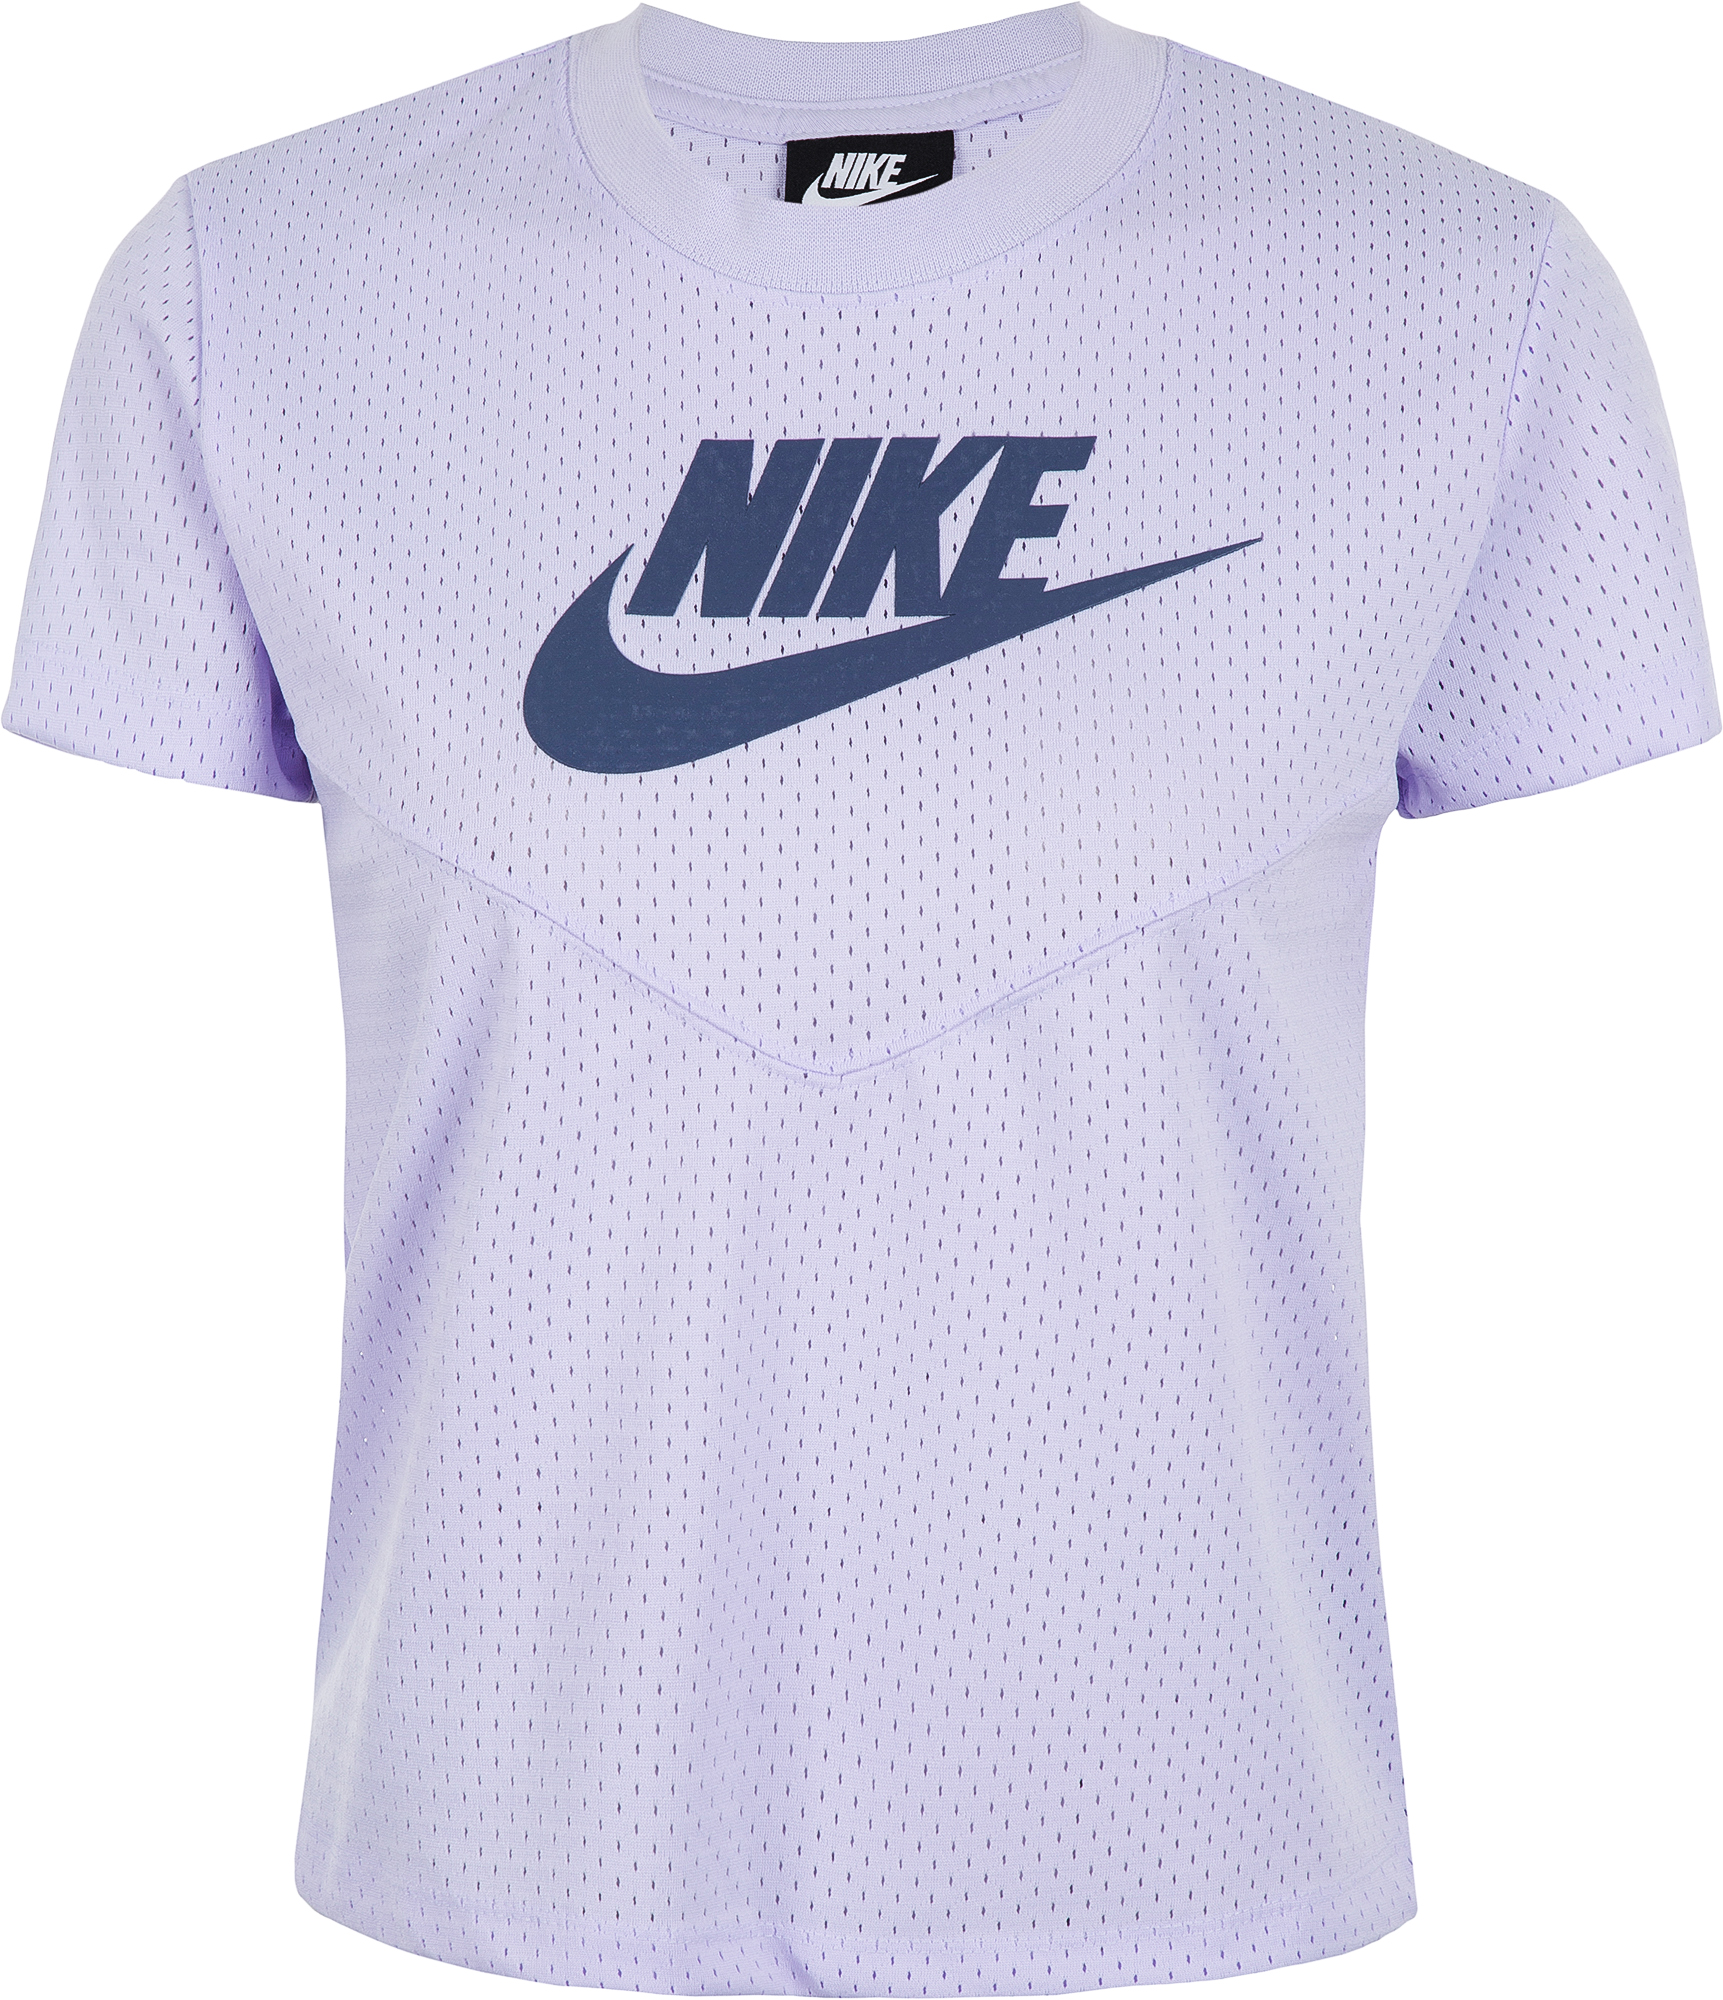 Nike Футболка женская Nike Heritage, размер 46-48 nike майка женская nike air размер 46 48